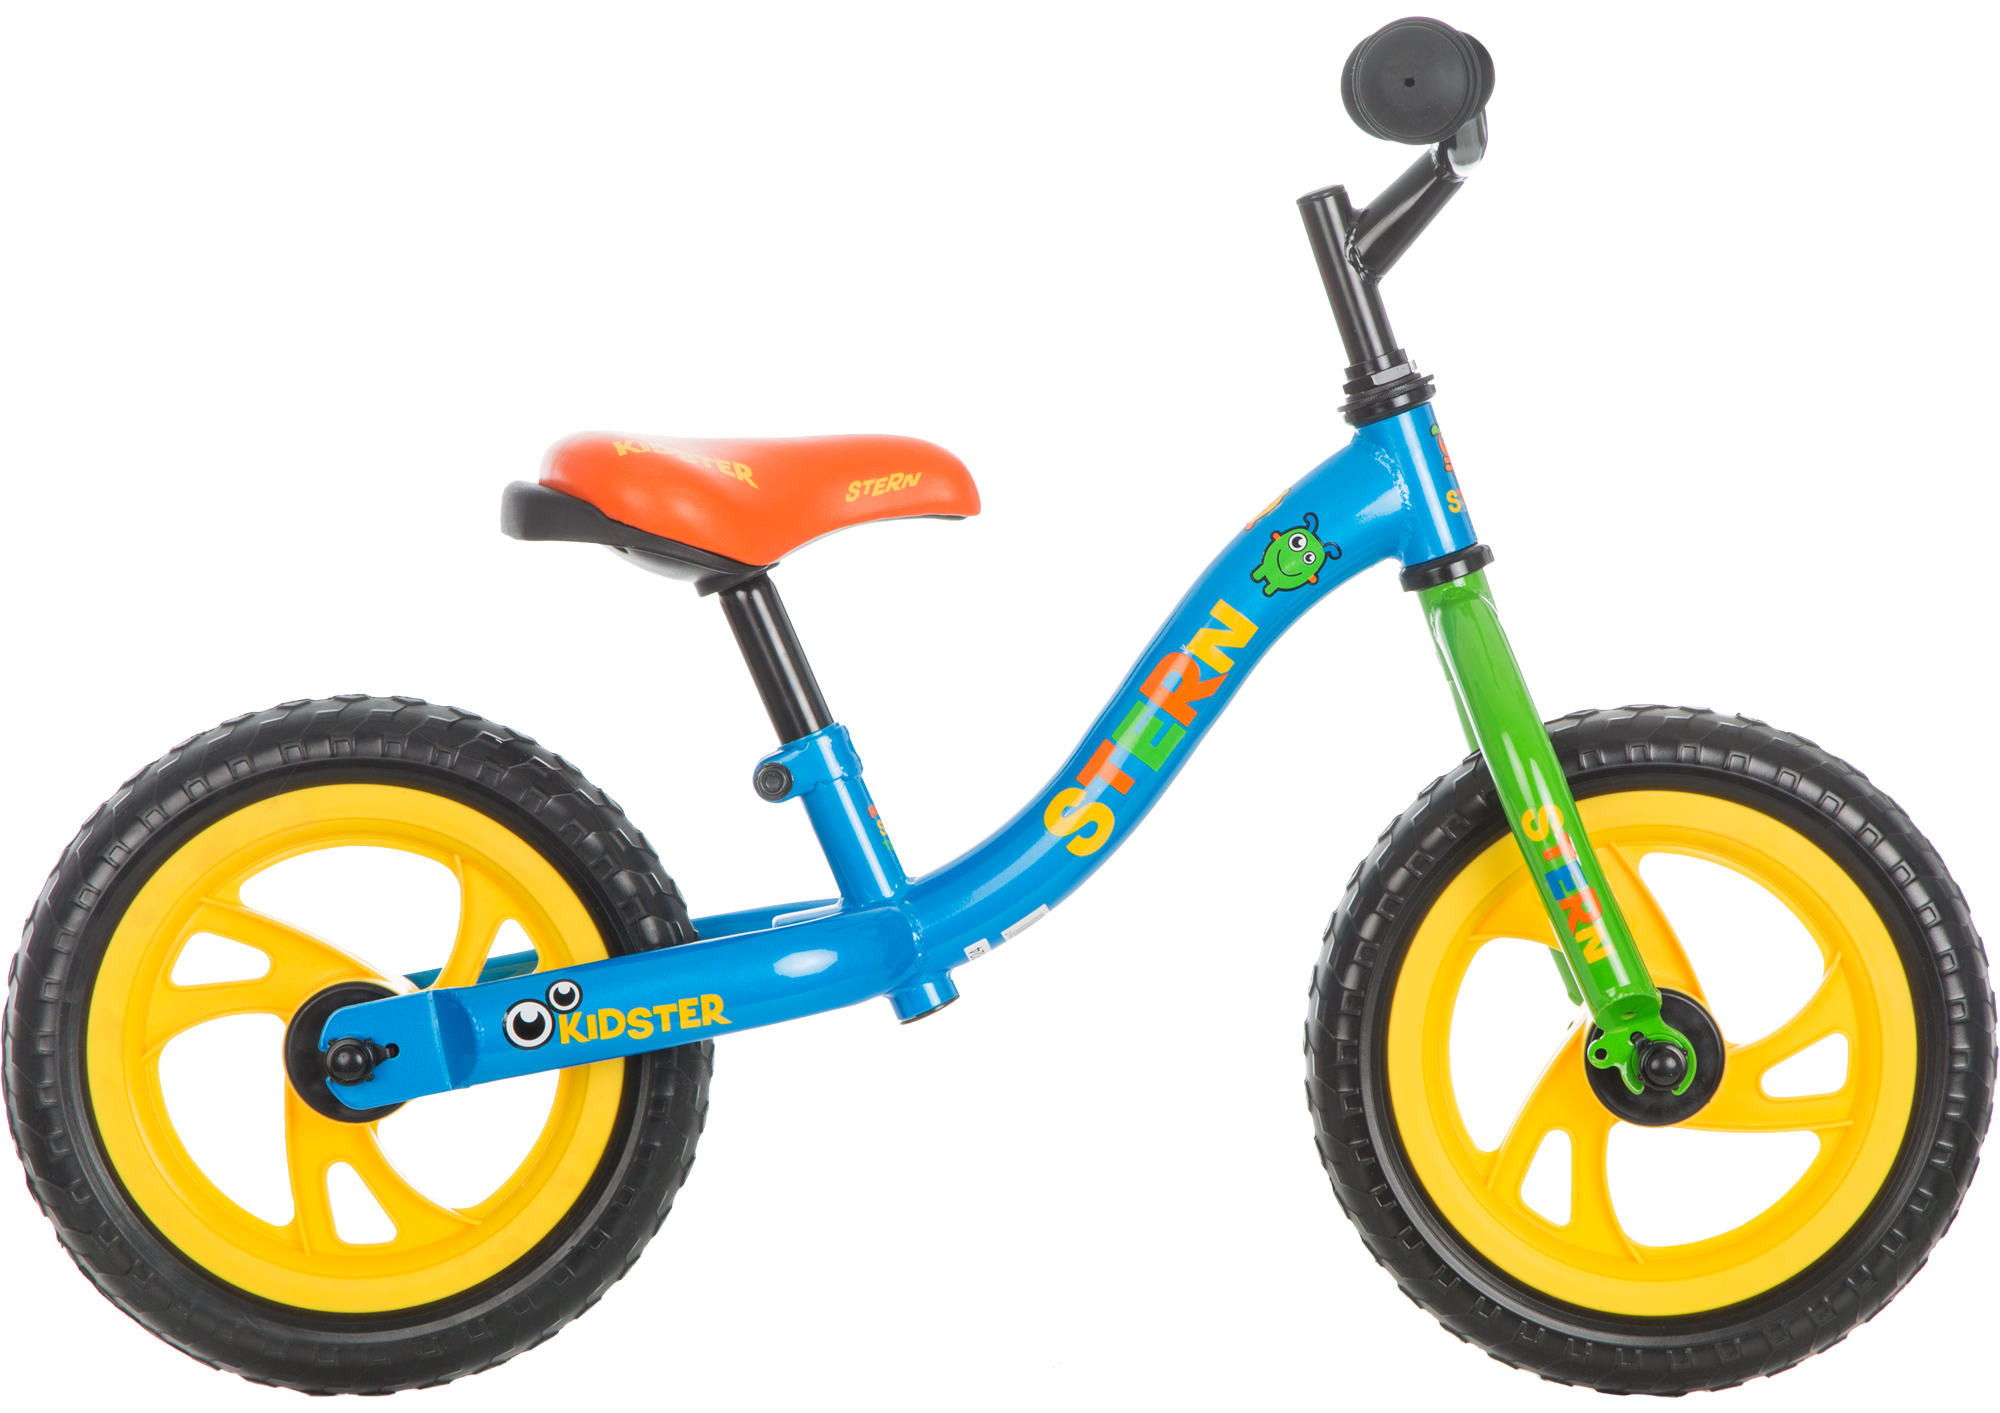 Stern Kidster 12 (2019), размер 89-114 цена